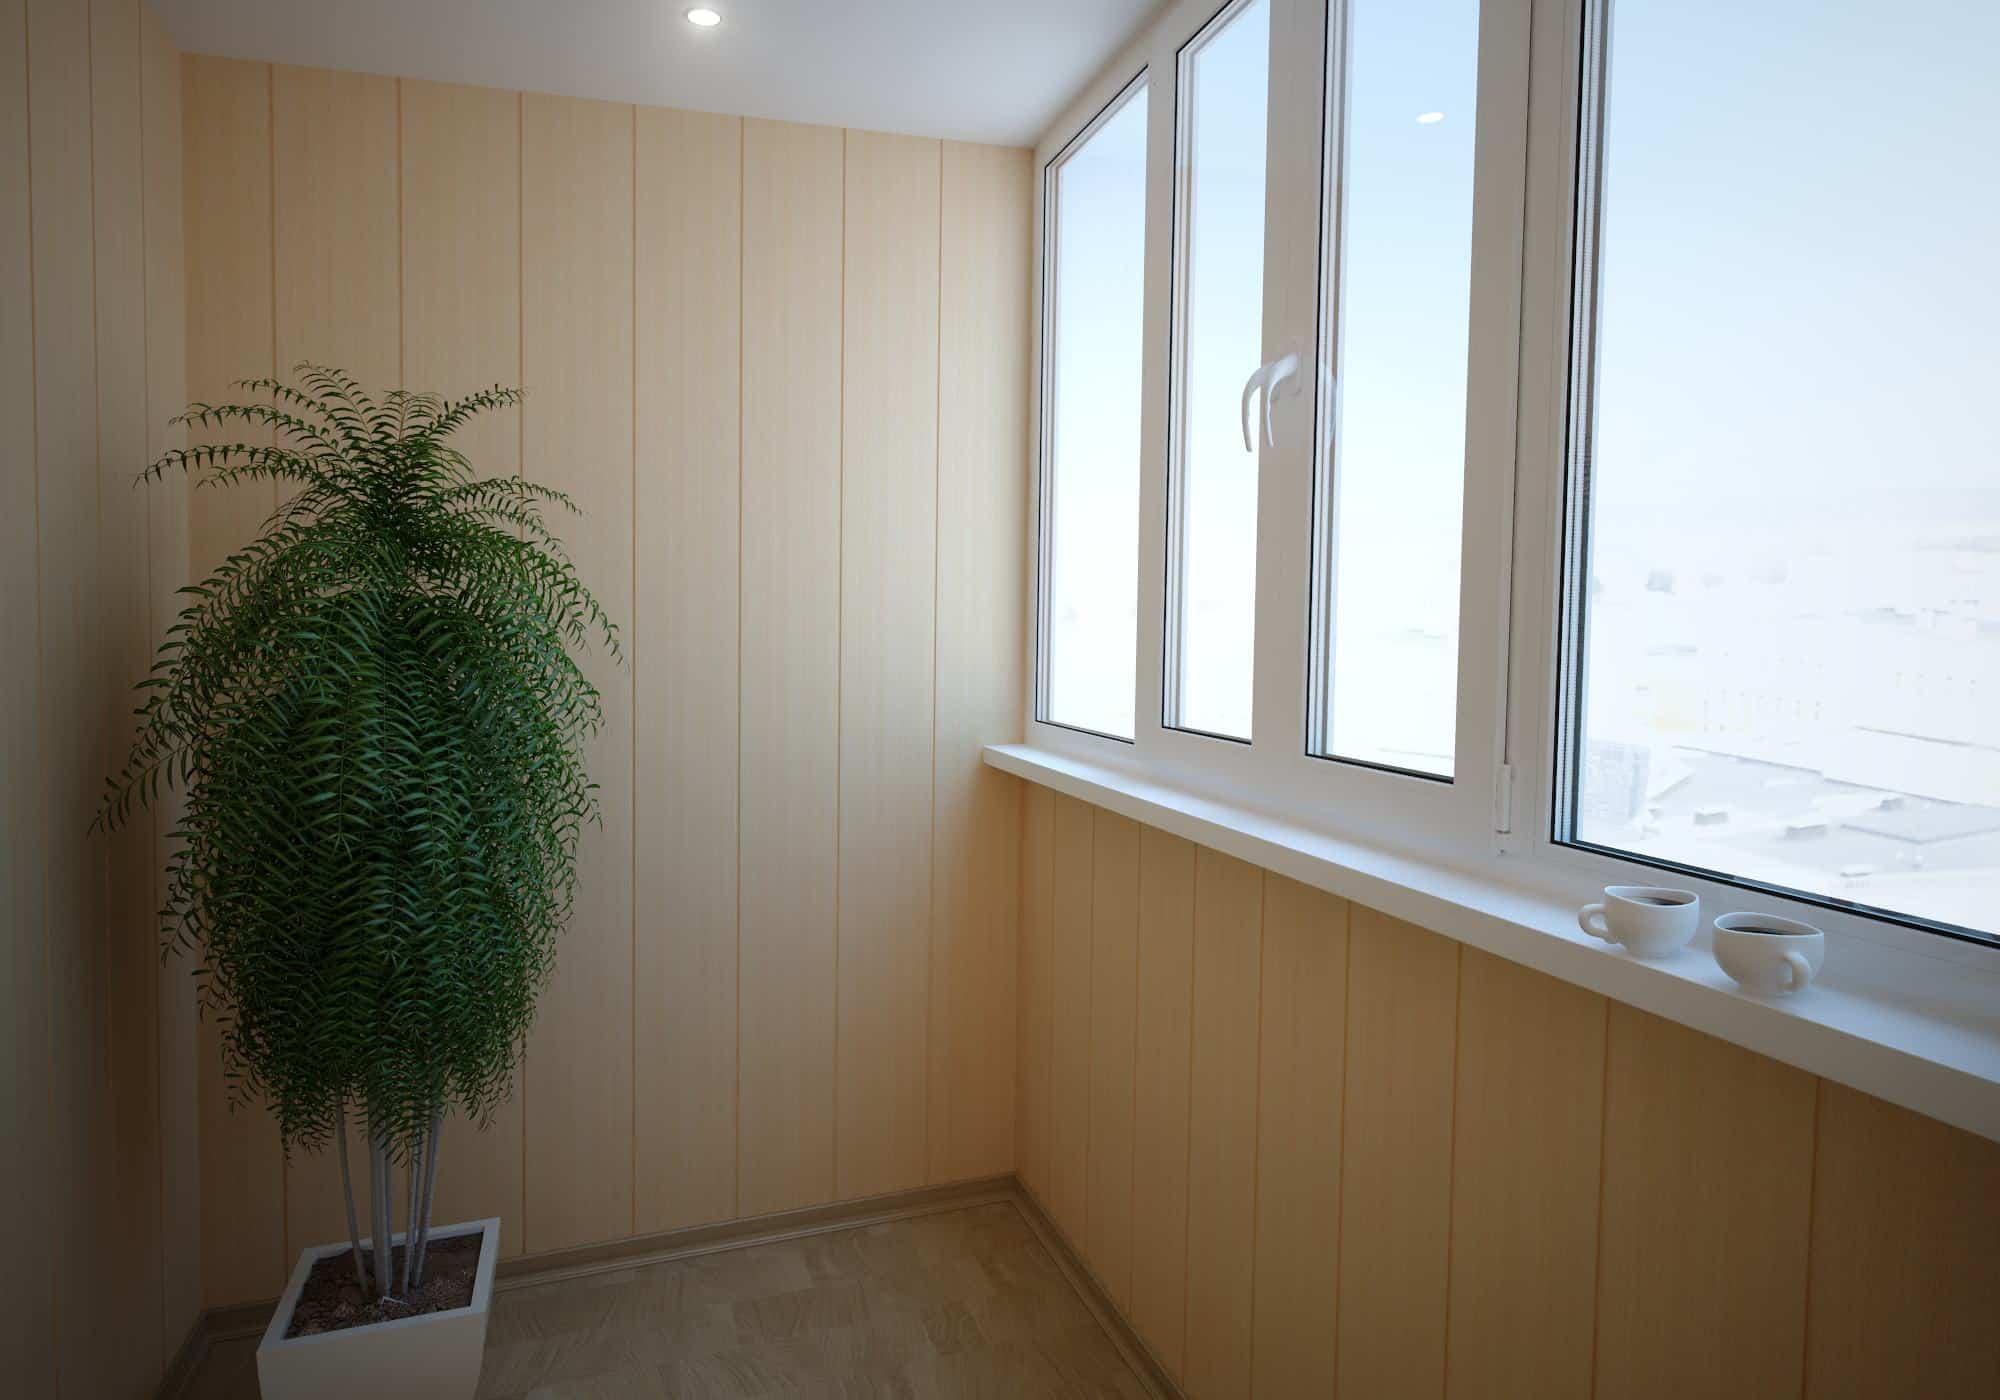 Как утеплить балкон своими руками | Как утеплить пластиковый балкон